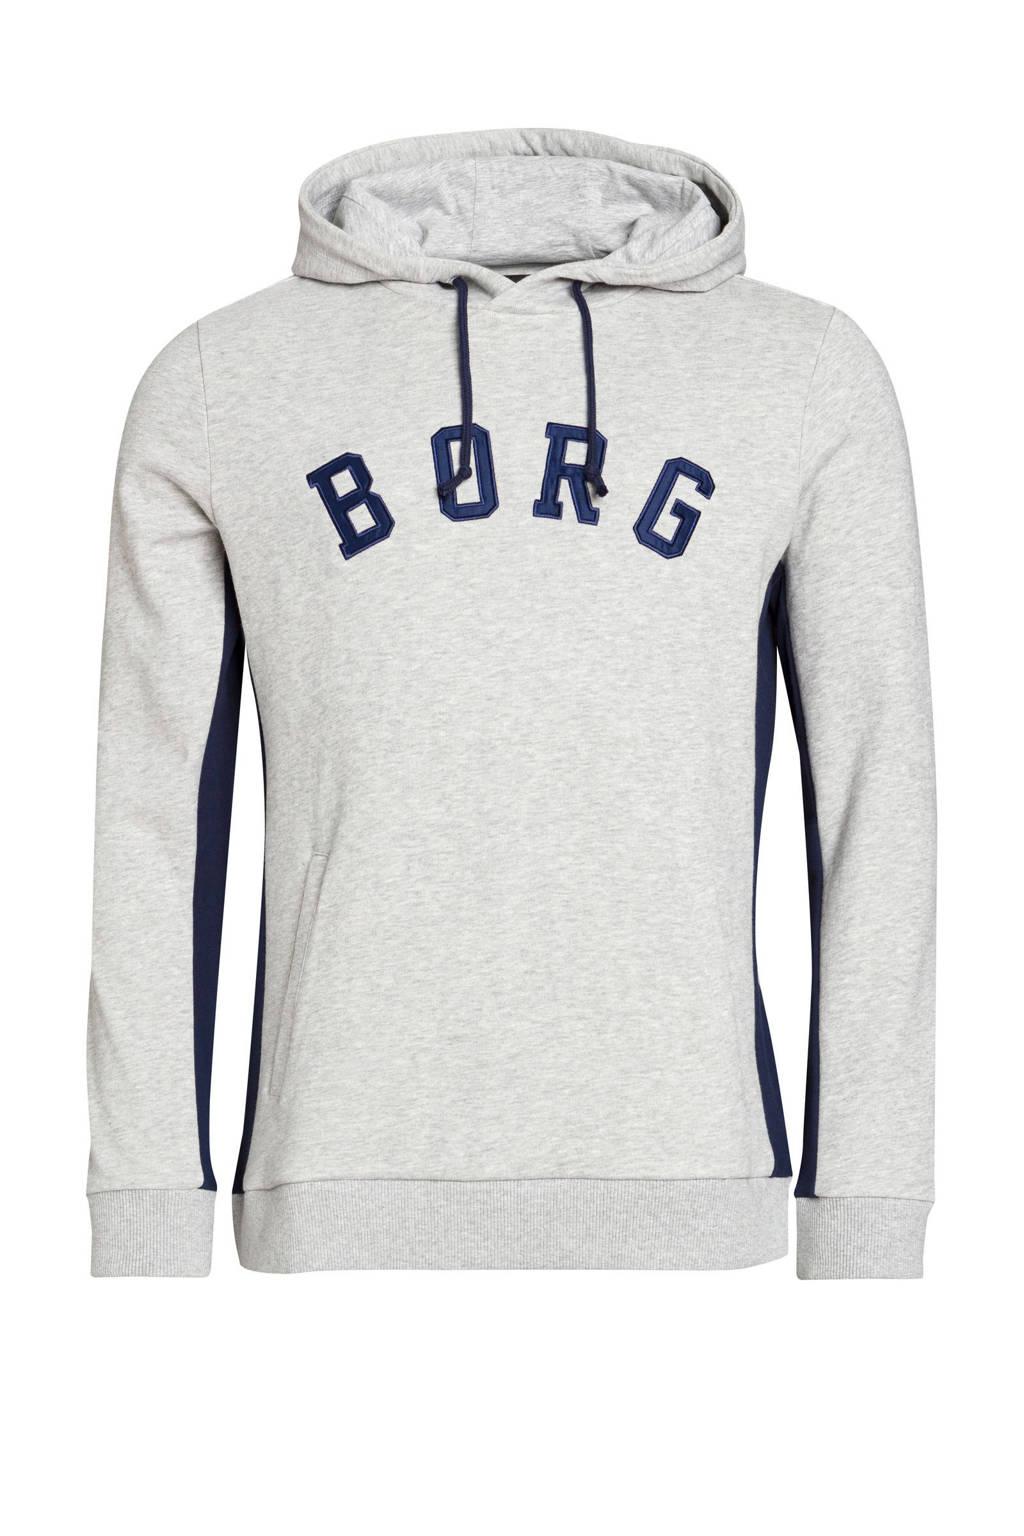 Björn Borg   sportsweater grijs melange, Grijs melange